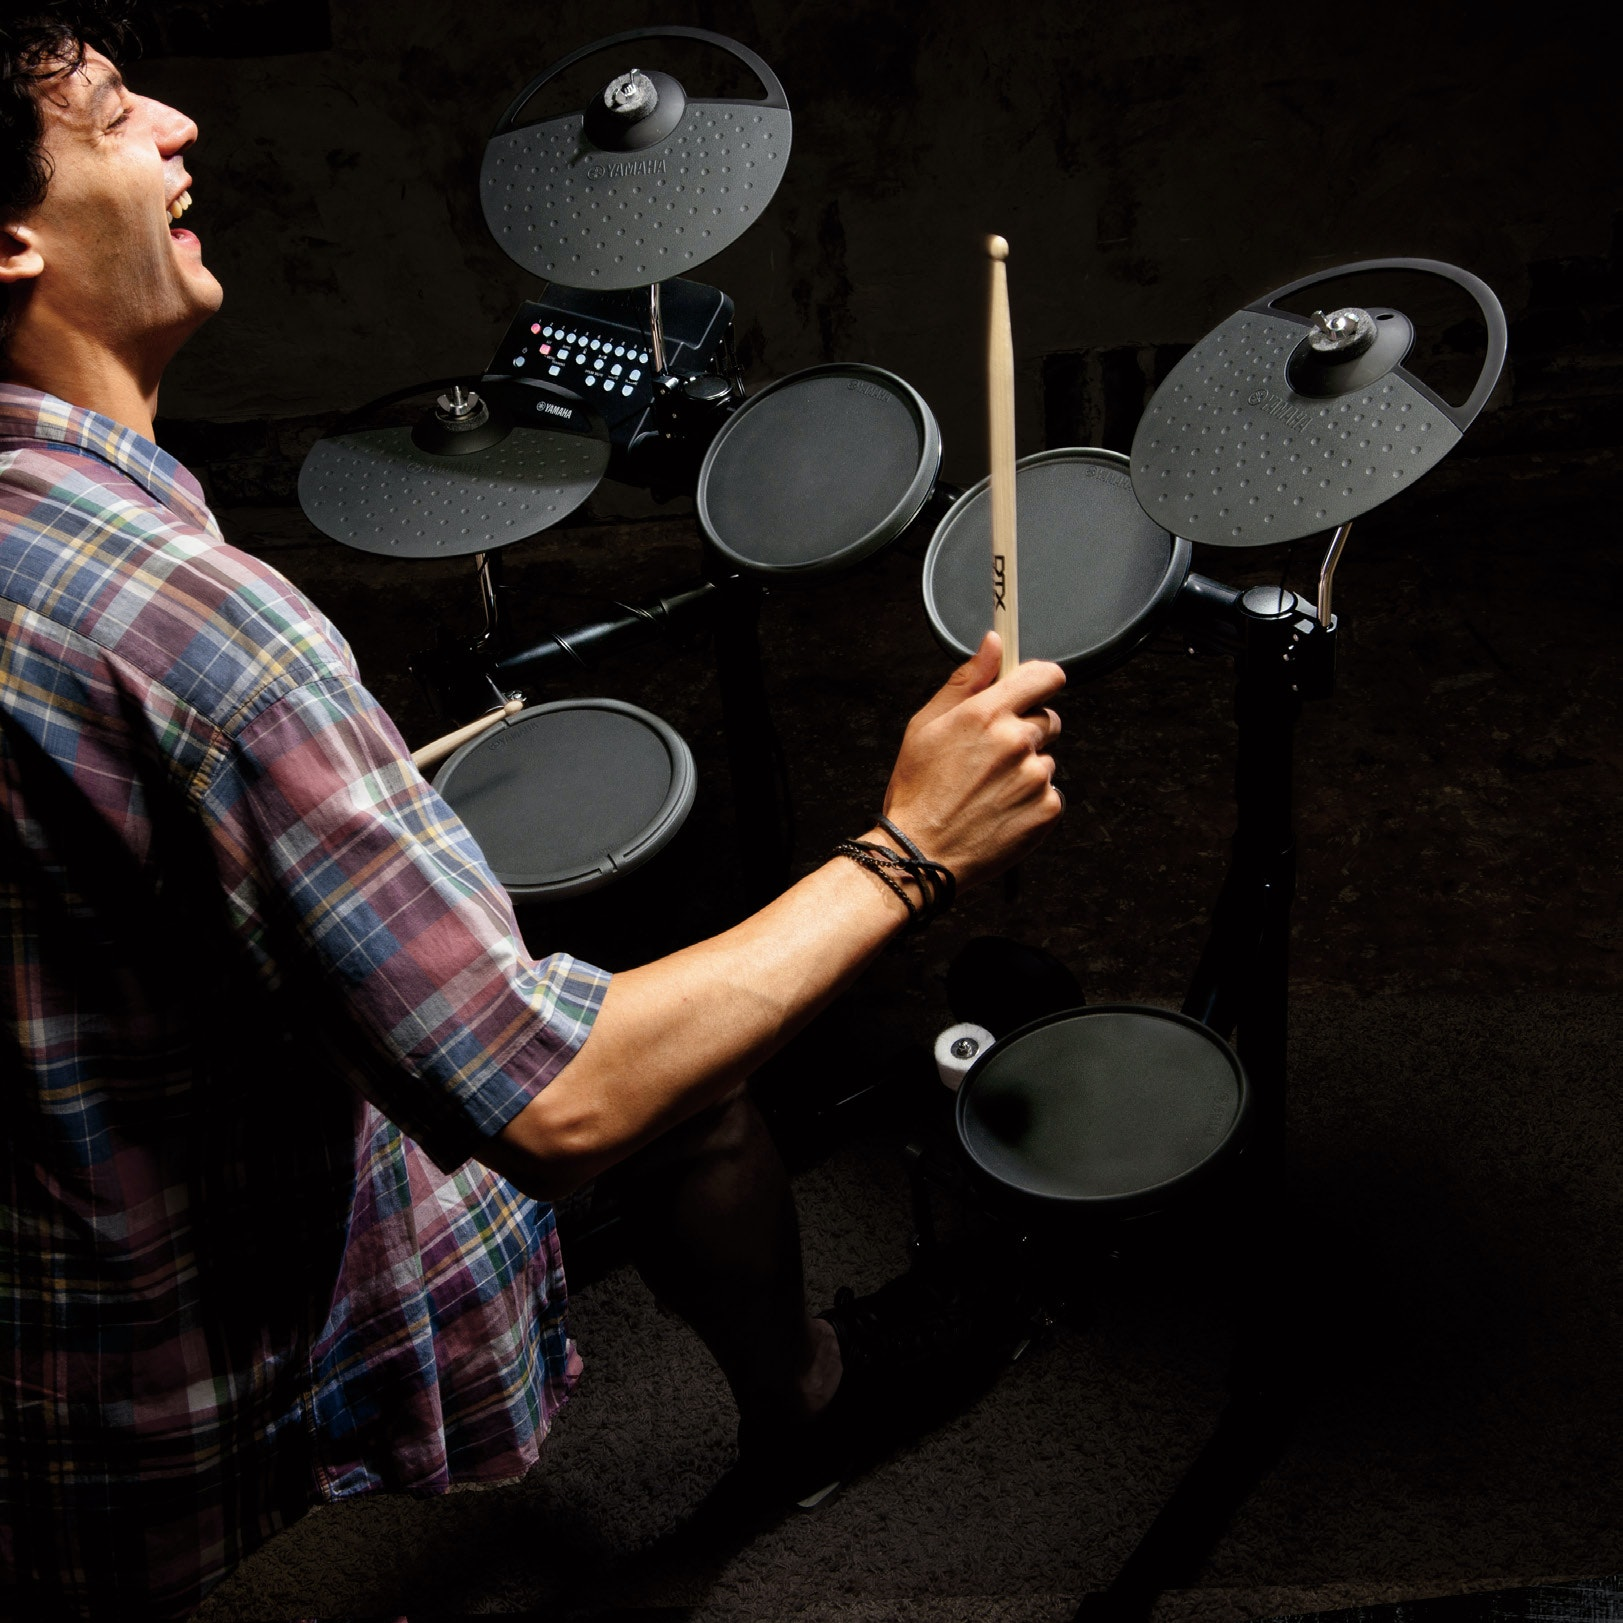 1x Yamaha DTX400 Electronic Drum Kit sweepstakes